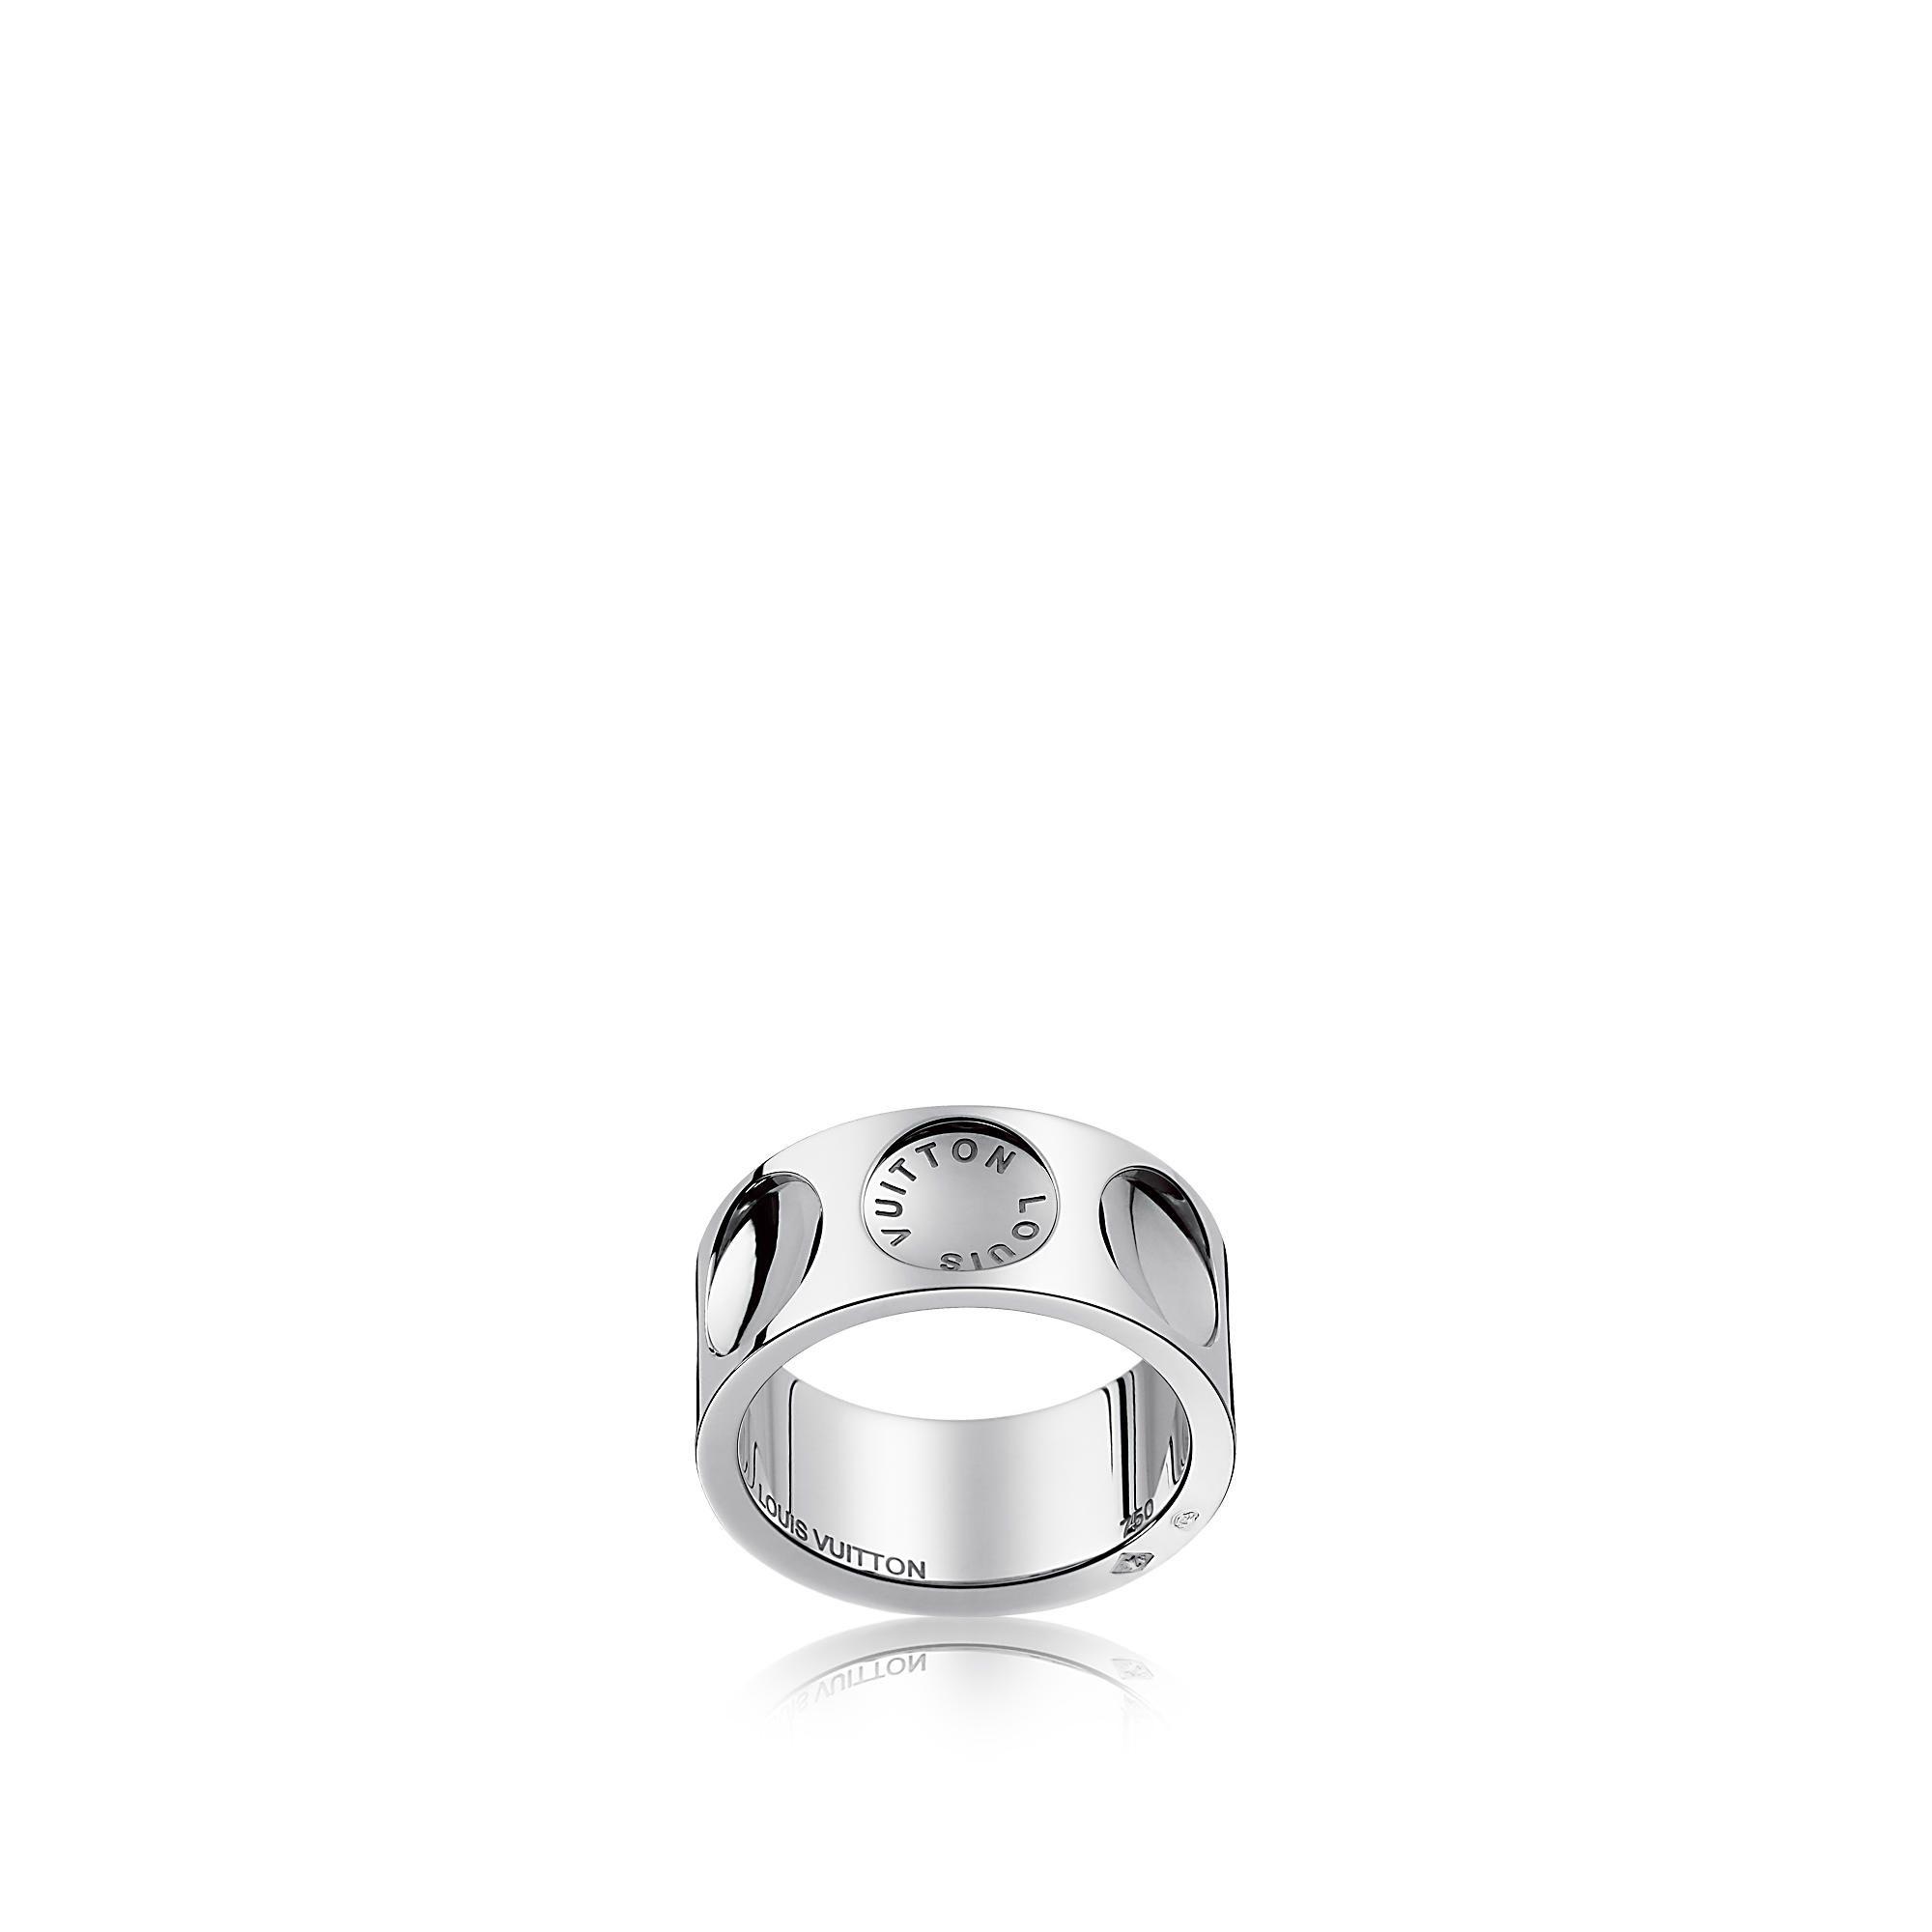 Discover Louis Vuitton Large Empreinte Ring In White Gold Via